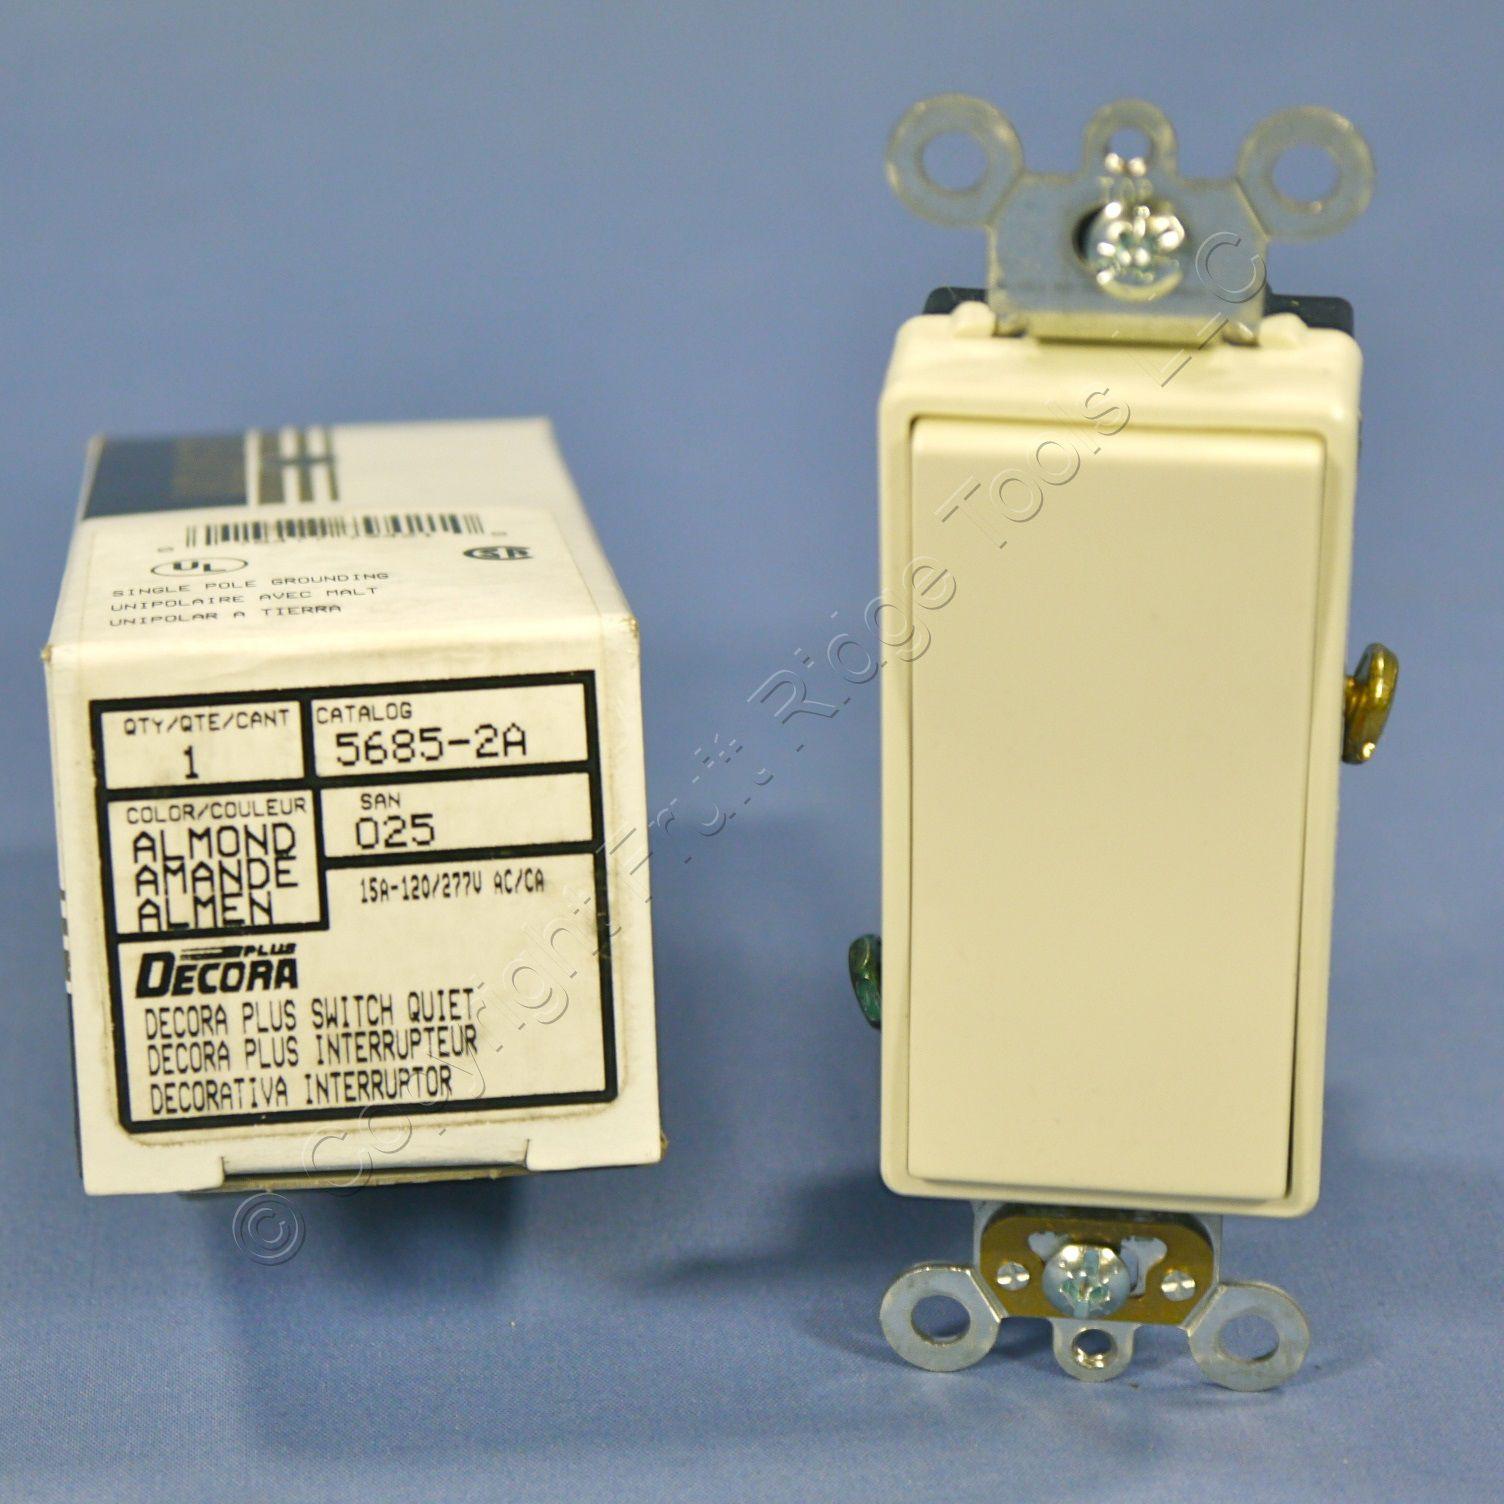 Leviton Almond Decora DUPLEX 1-Pole Rocker Light Switch Duplex 15A Bulk 5634-A